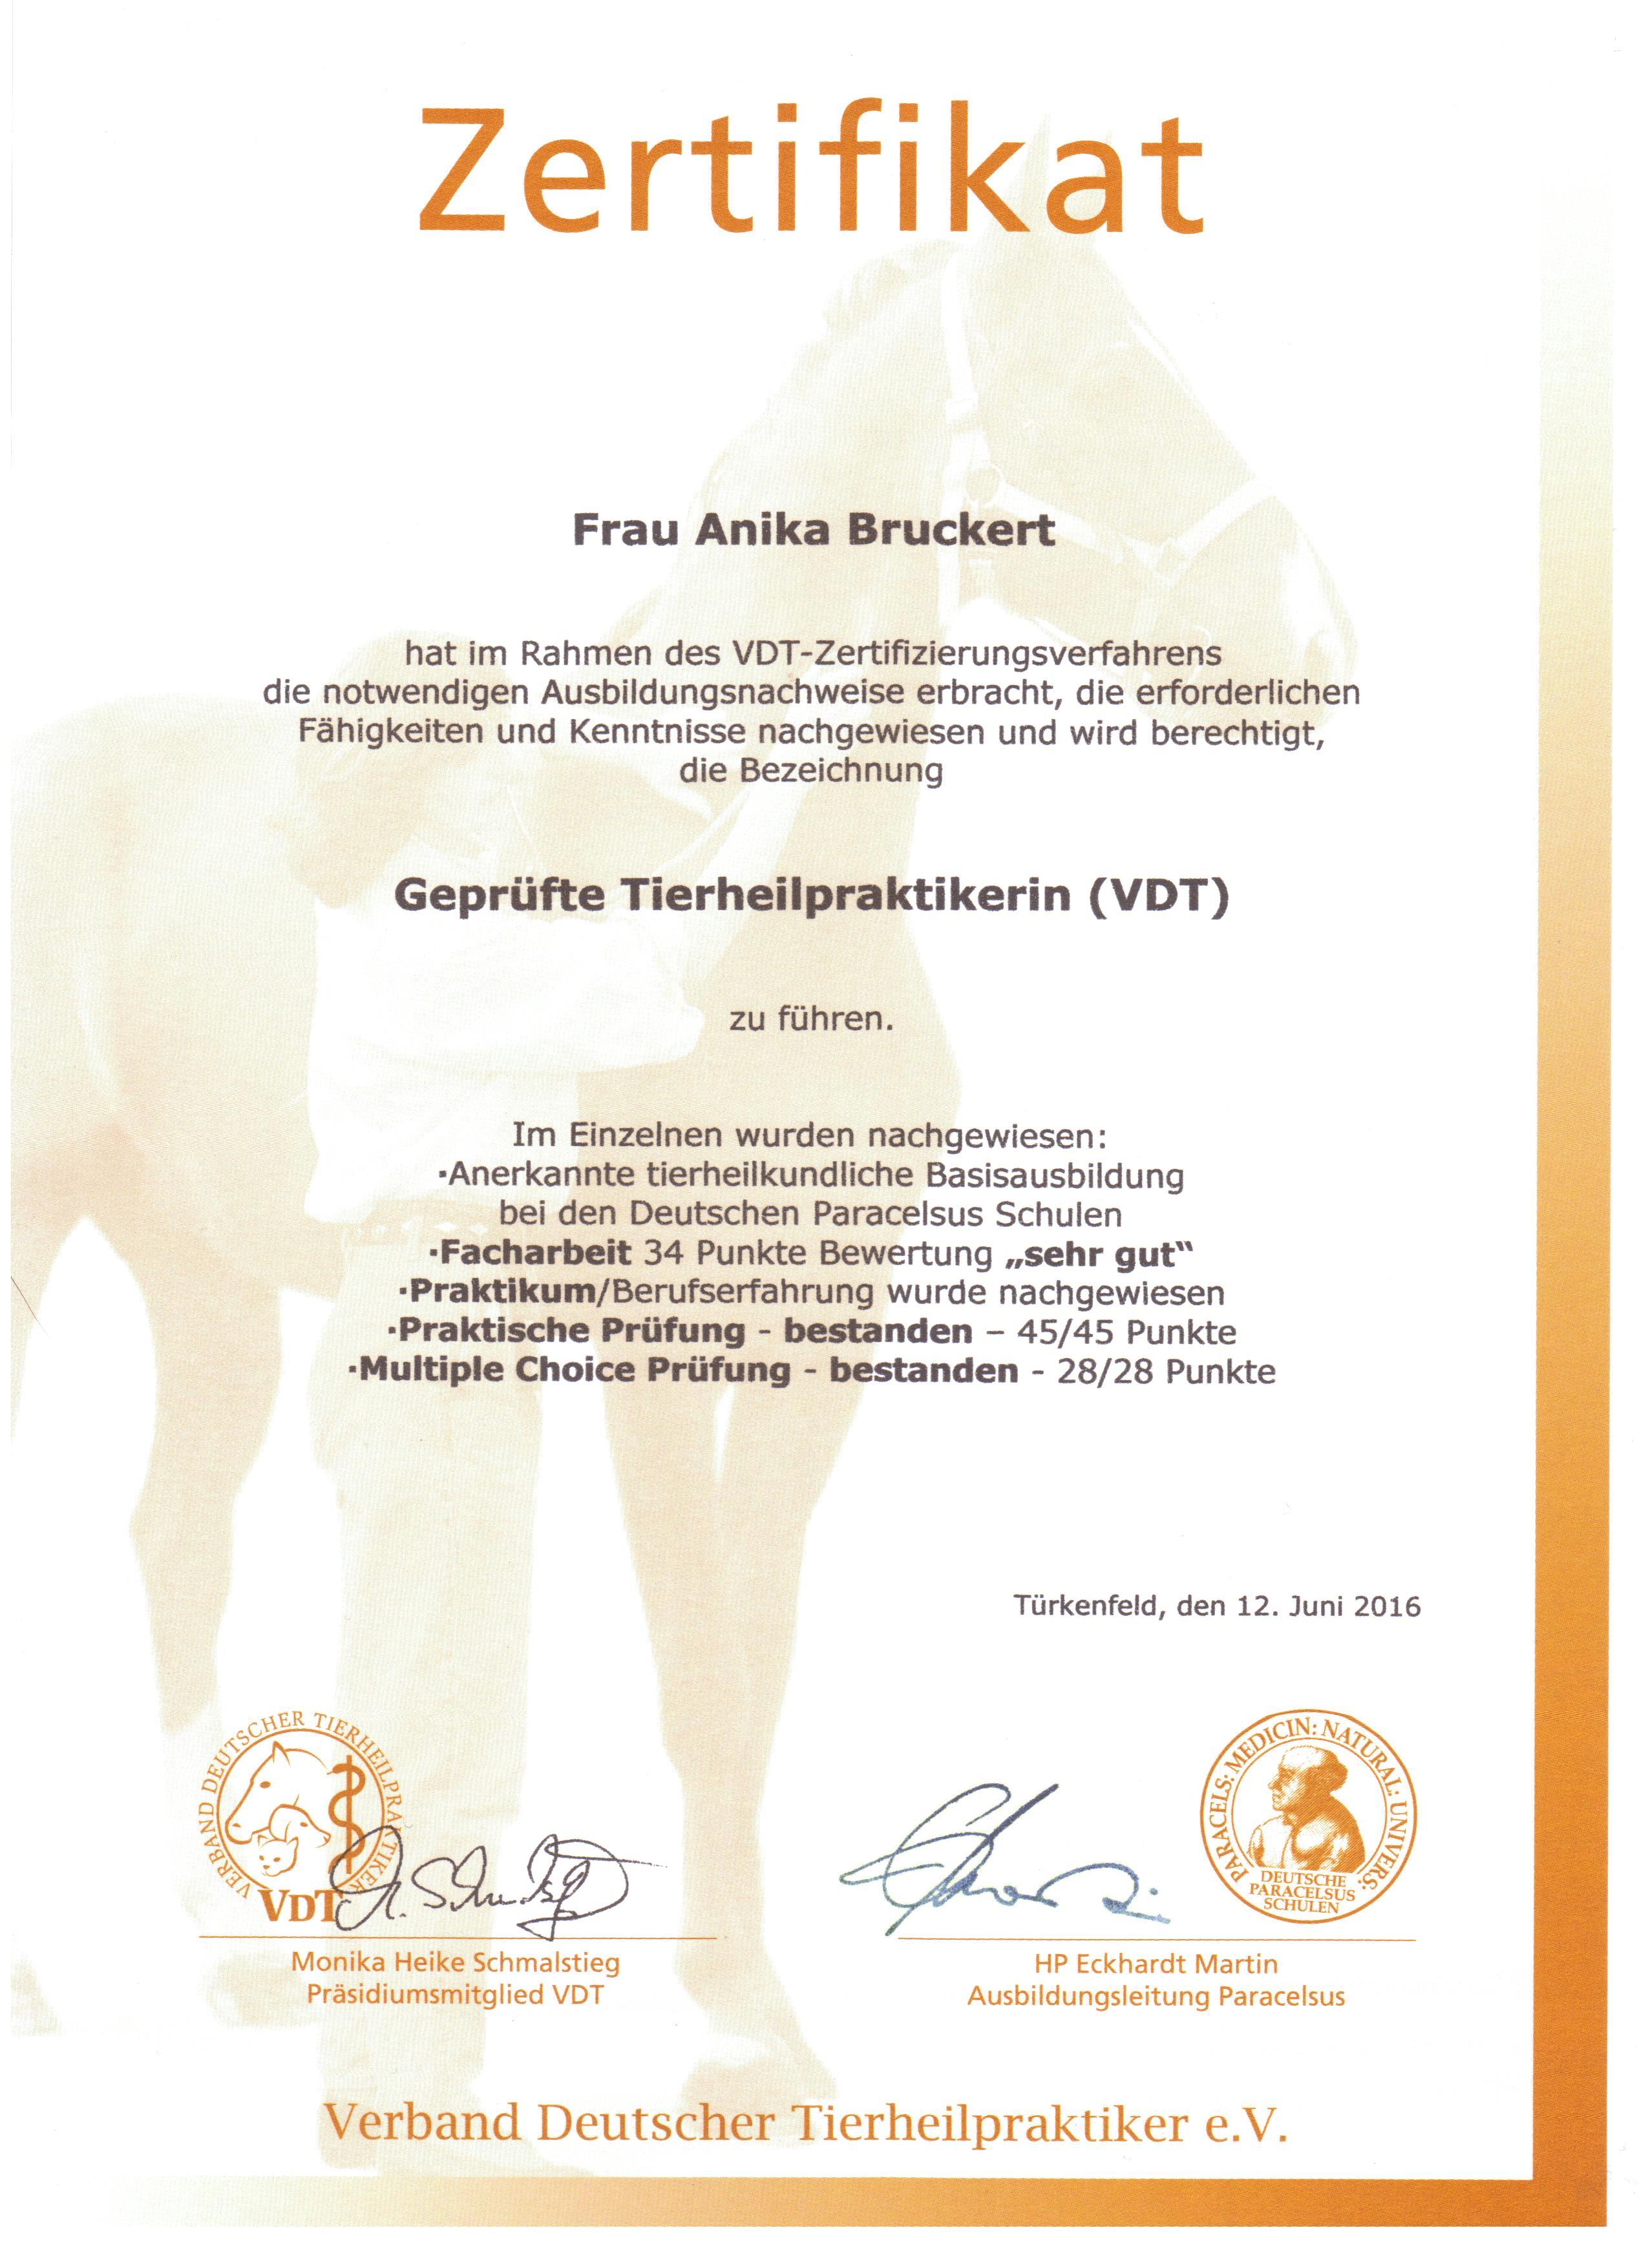 VDT-Zertifikat